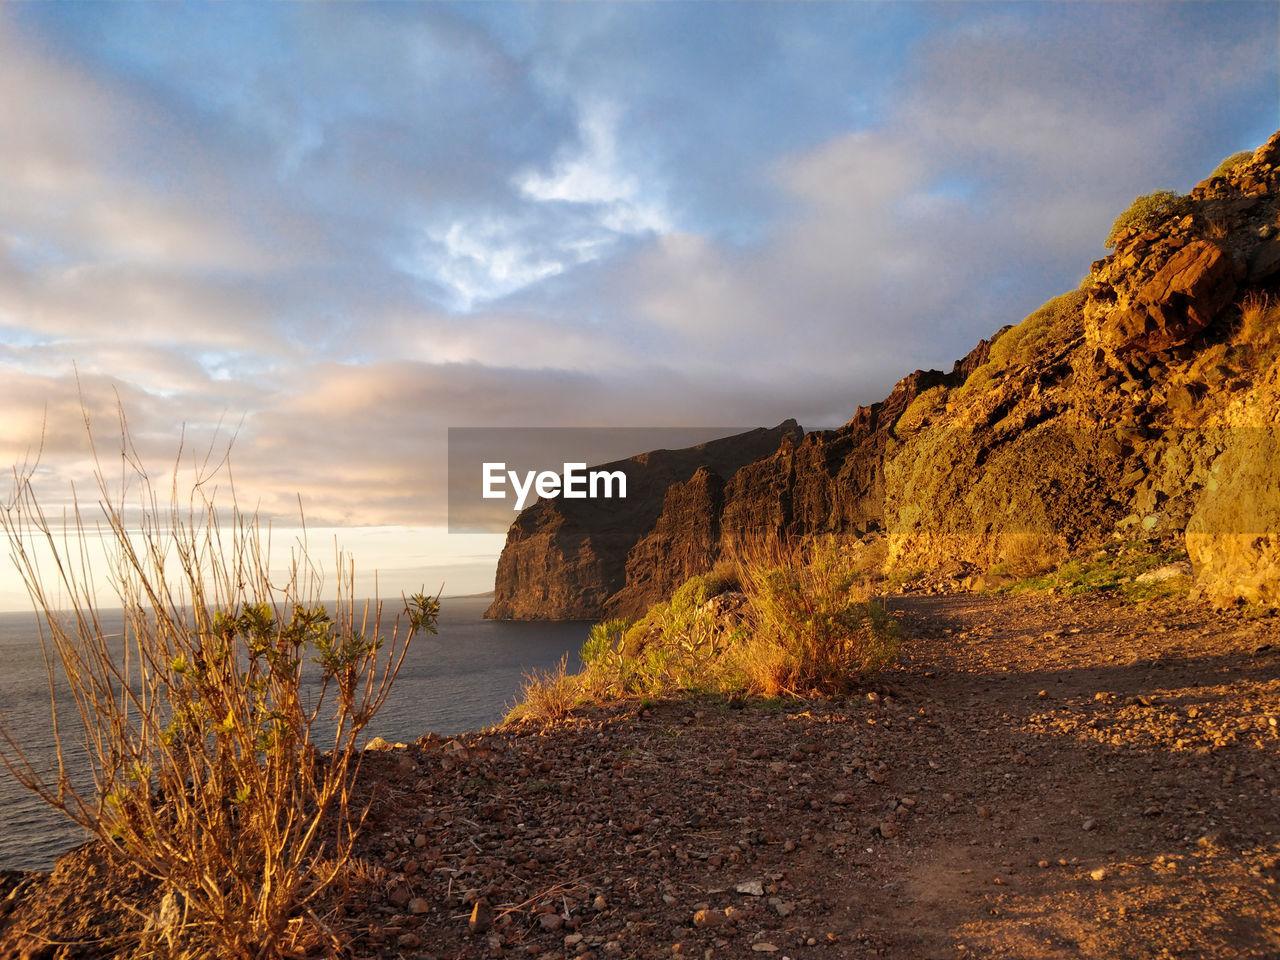 sky, water, cloud - sky, scenics - nature, beauty in nature, tranquility, tranquil scene, sea, nature, beach, no people, sunset, non-urban scene, land, mountain, rock, idyllic, plant, outdoors